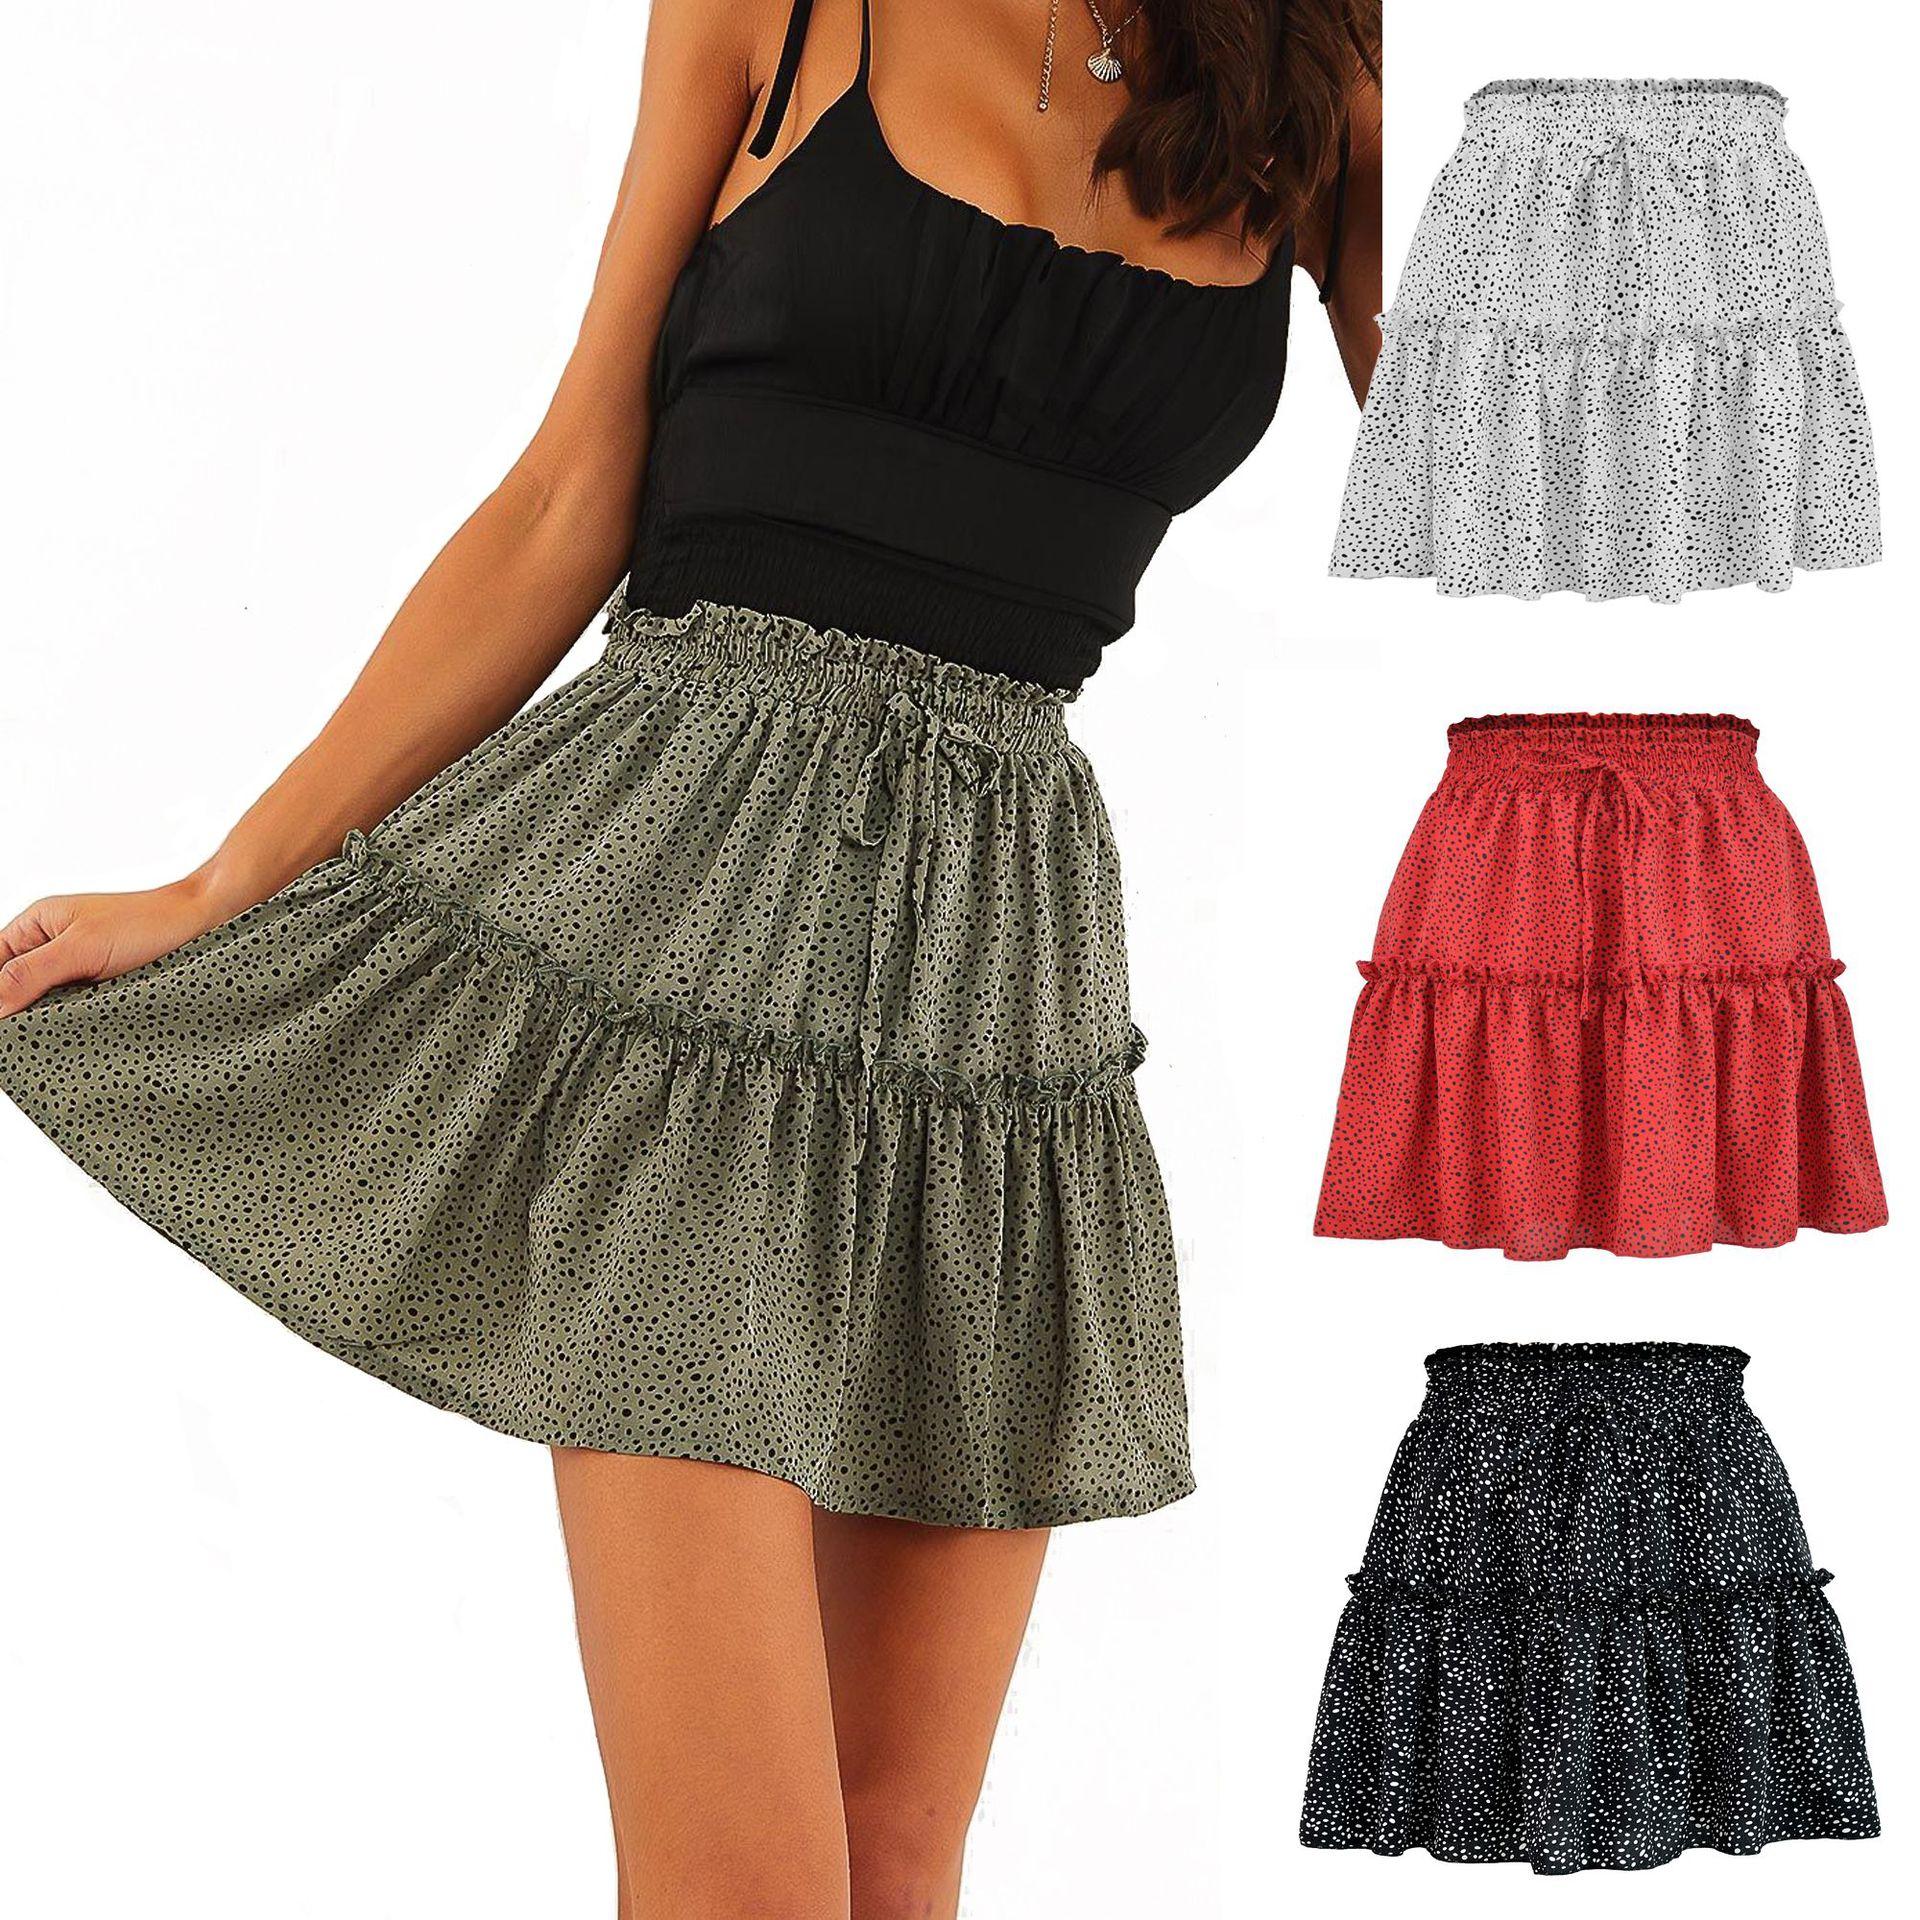 Woman skirts 2021 summer tall waist chiffon printing pleating wave point skirts womens